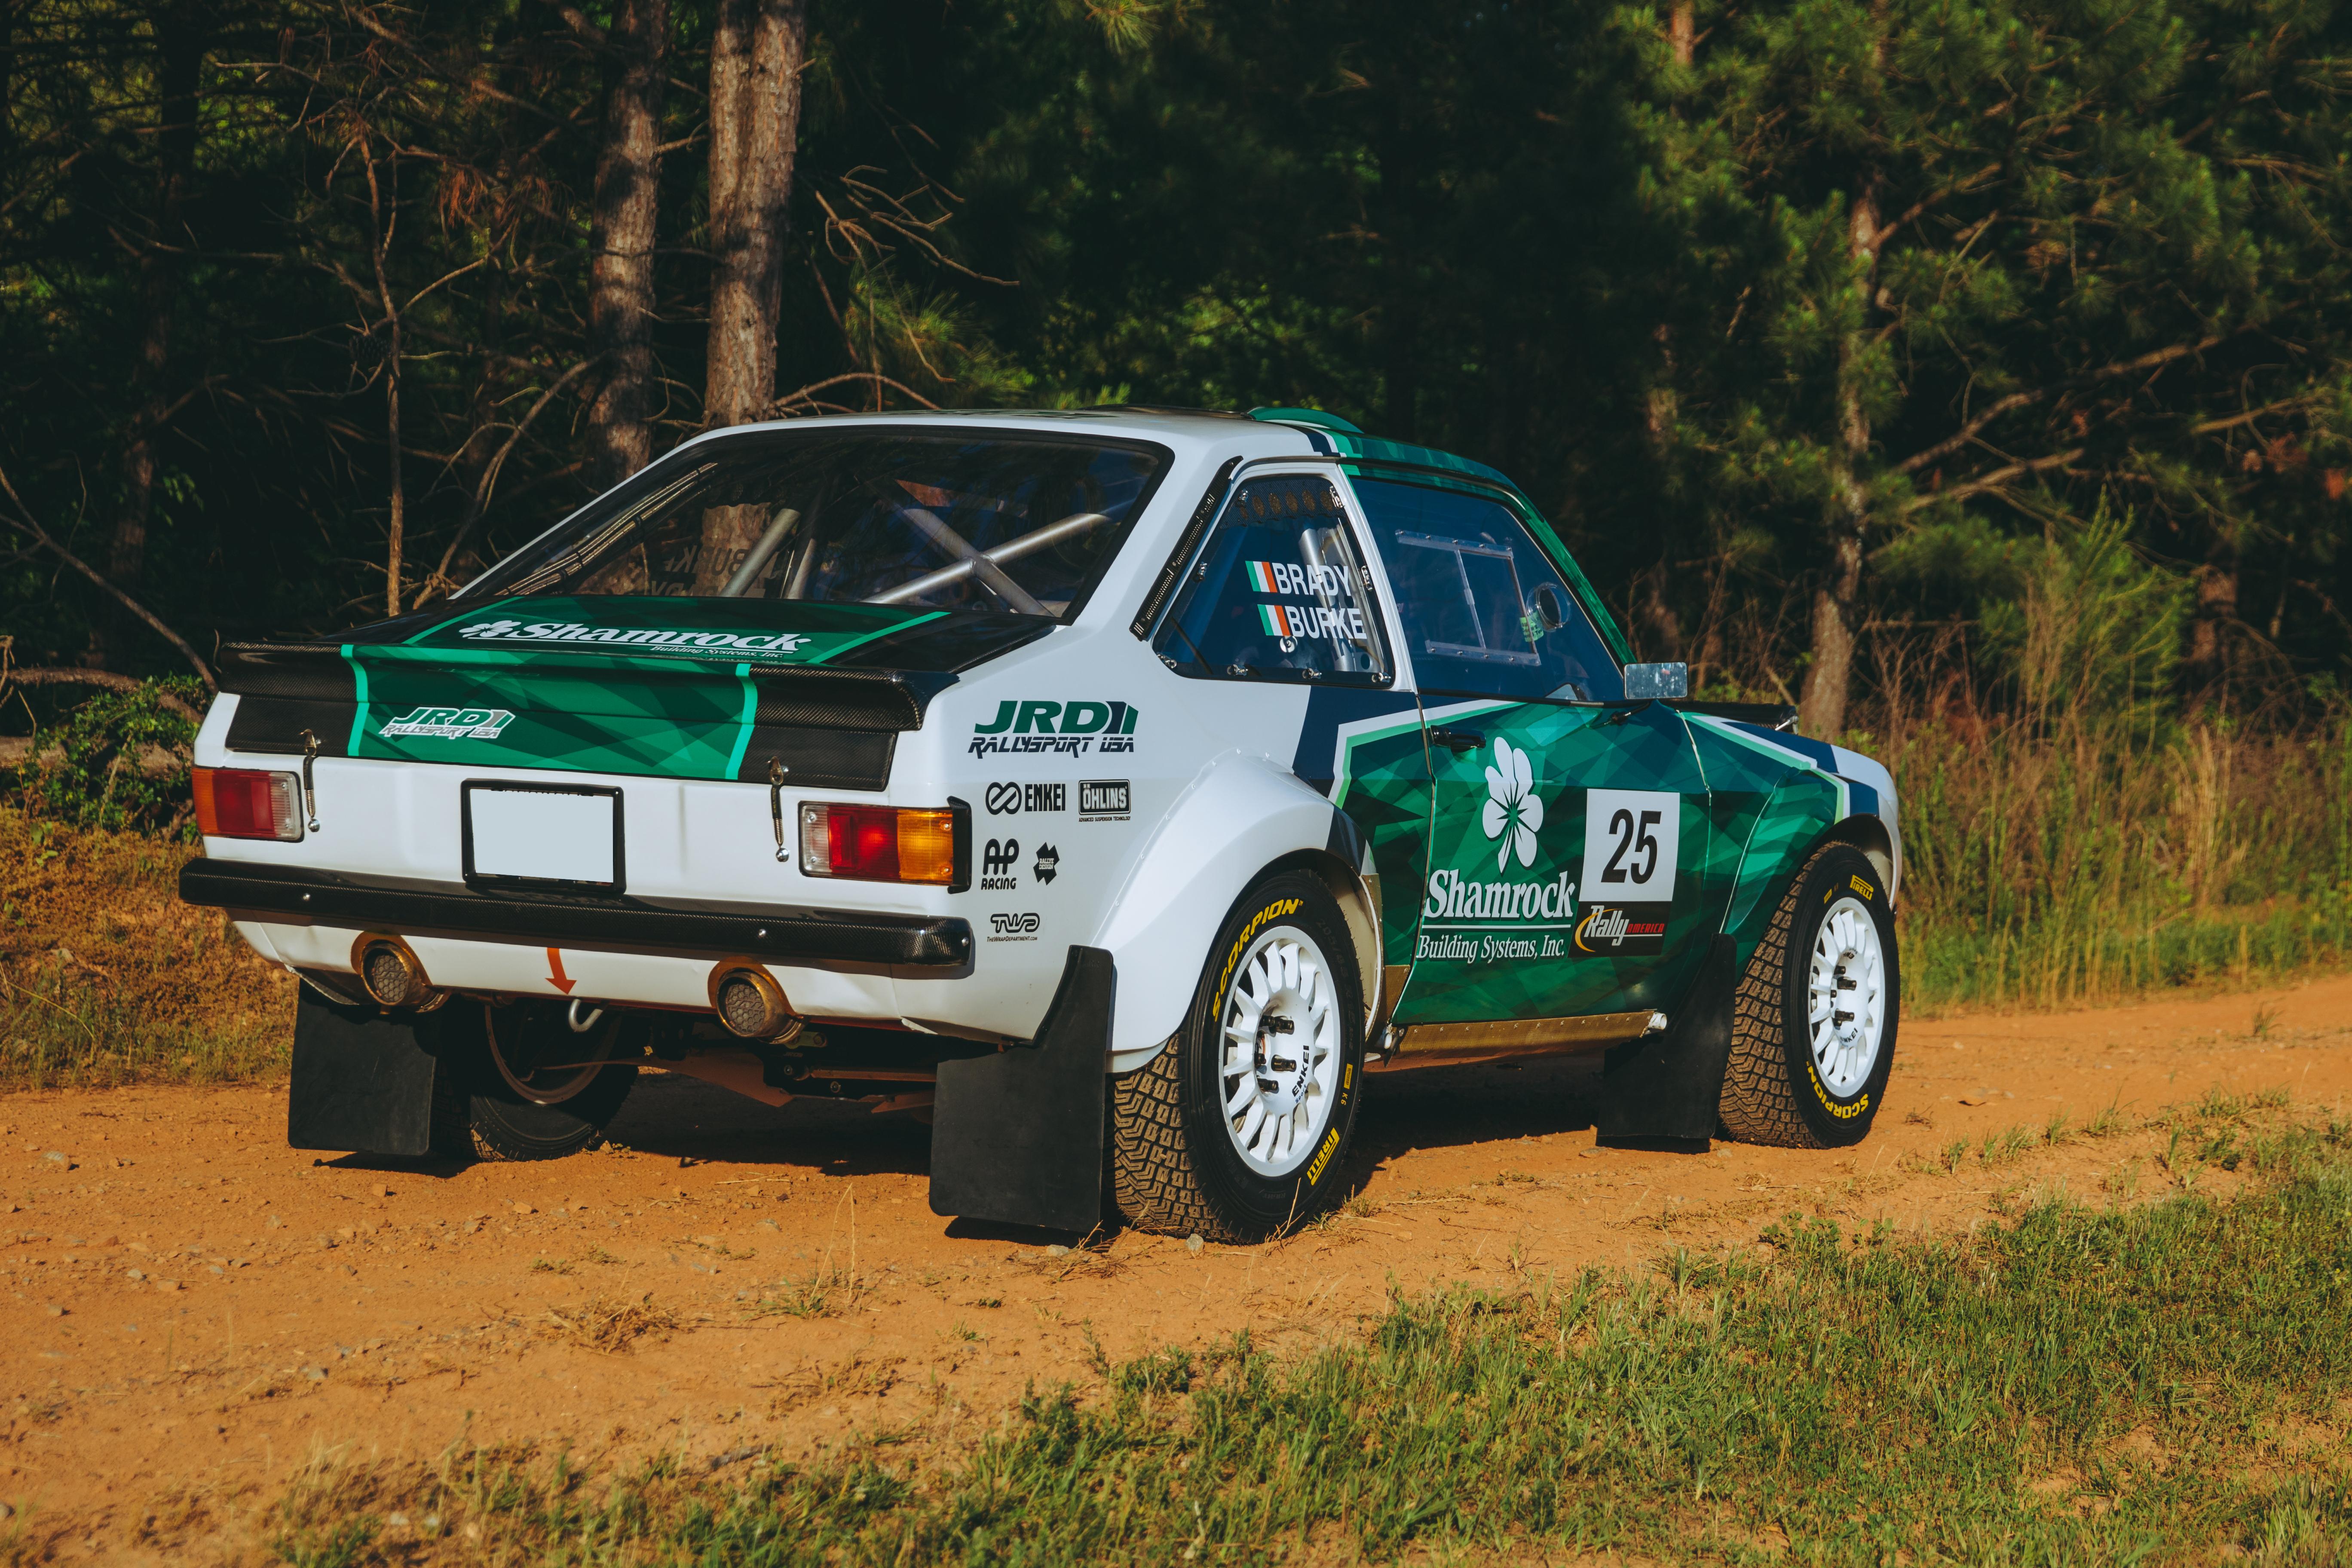 The Wildest Escort Ever - Very Custom Mk2 Rally Car (Pic Heavy)